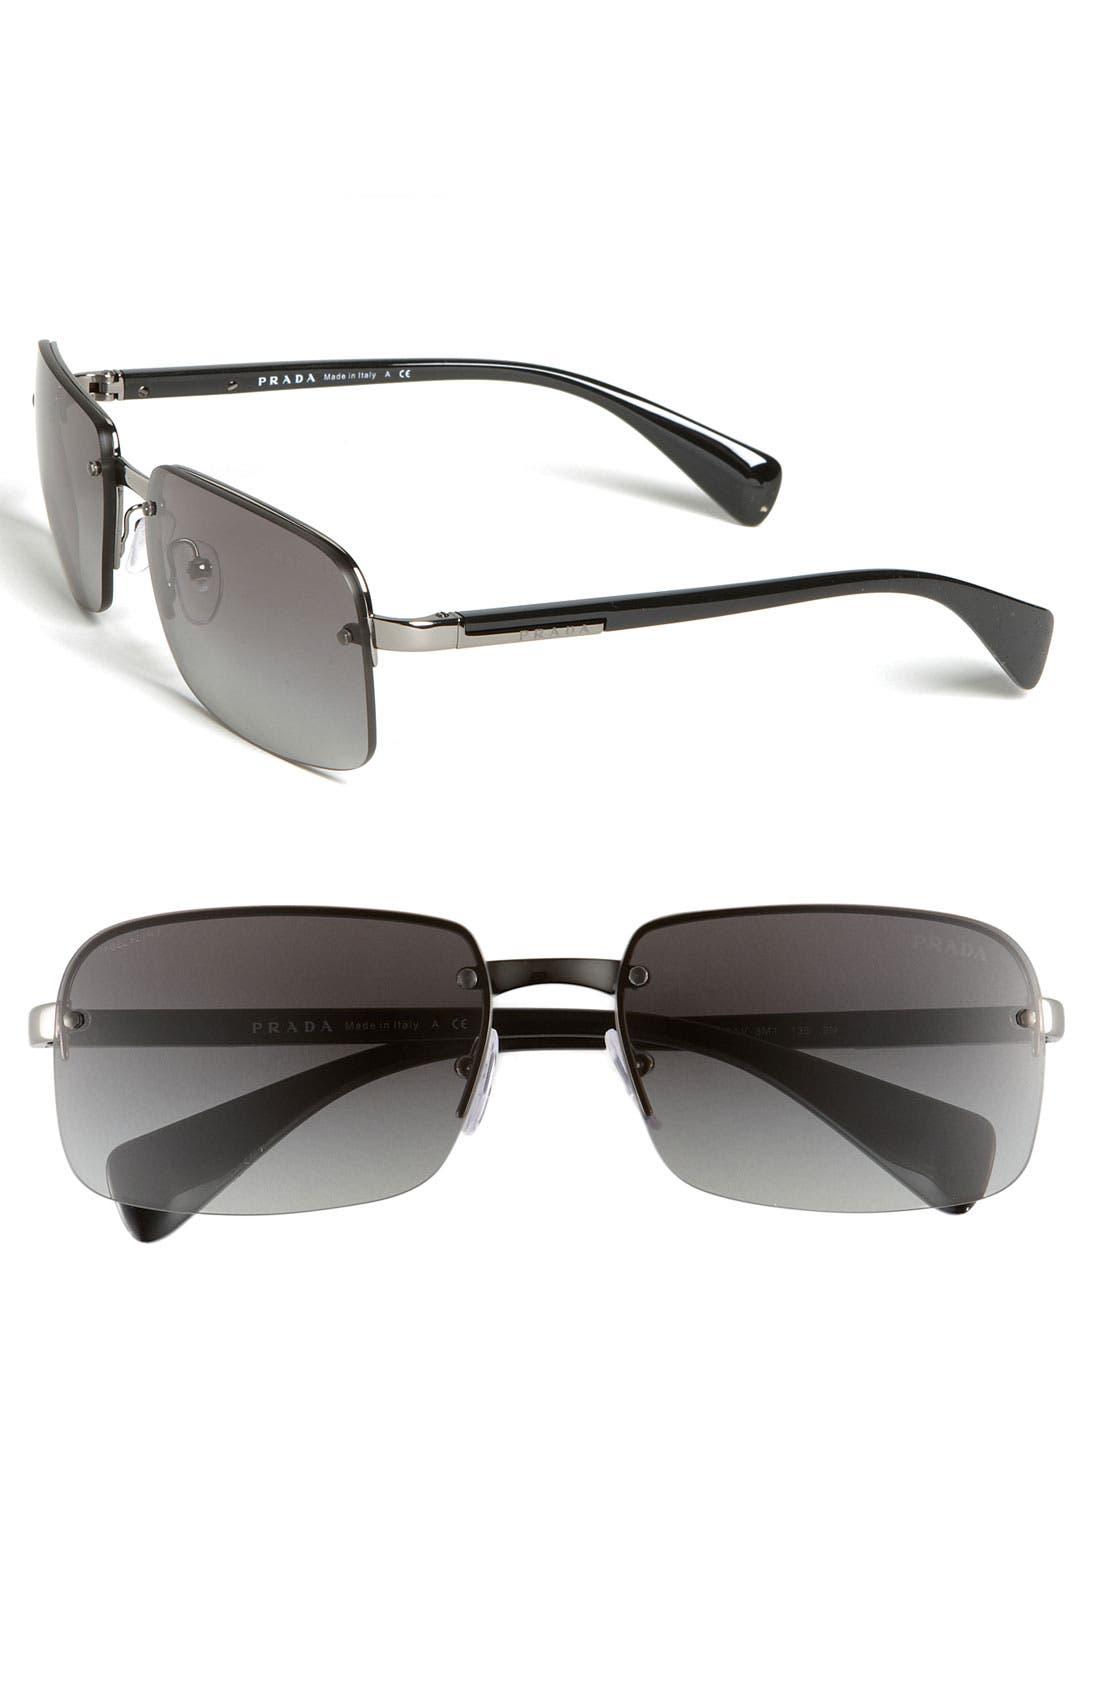 Alternate Image 1 Selected - Prada 60mm Rimless Sunglasses